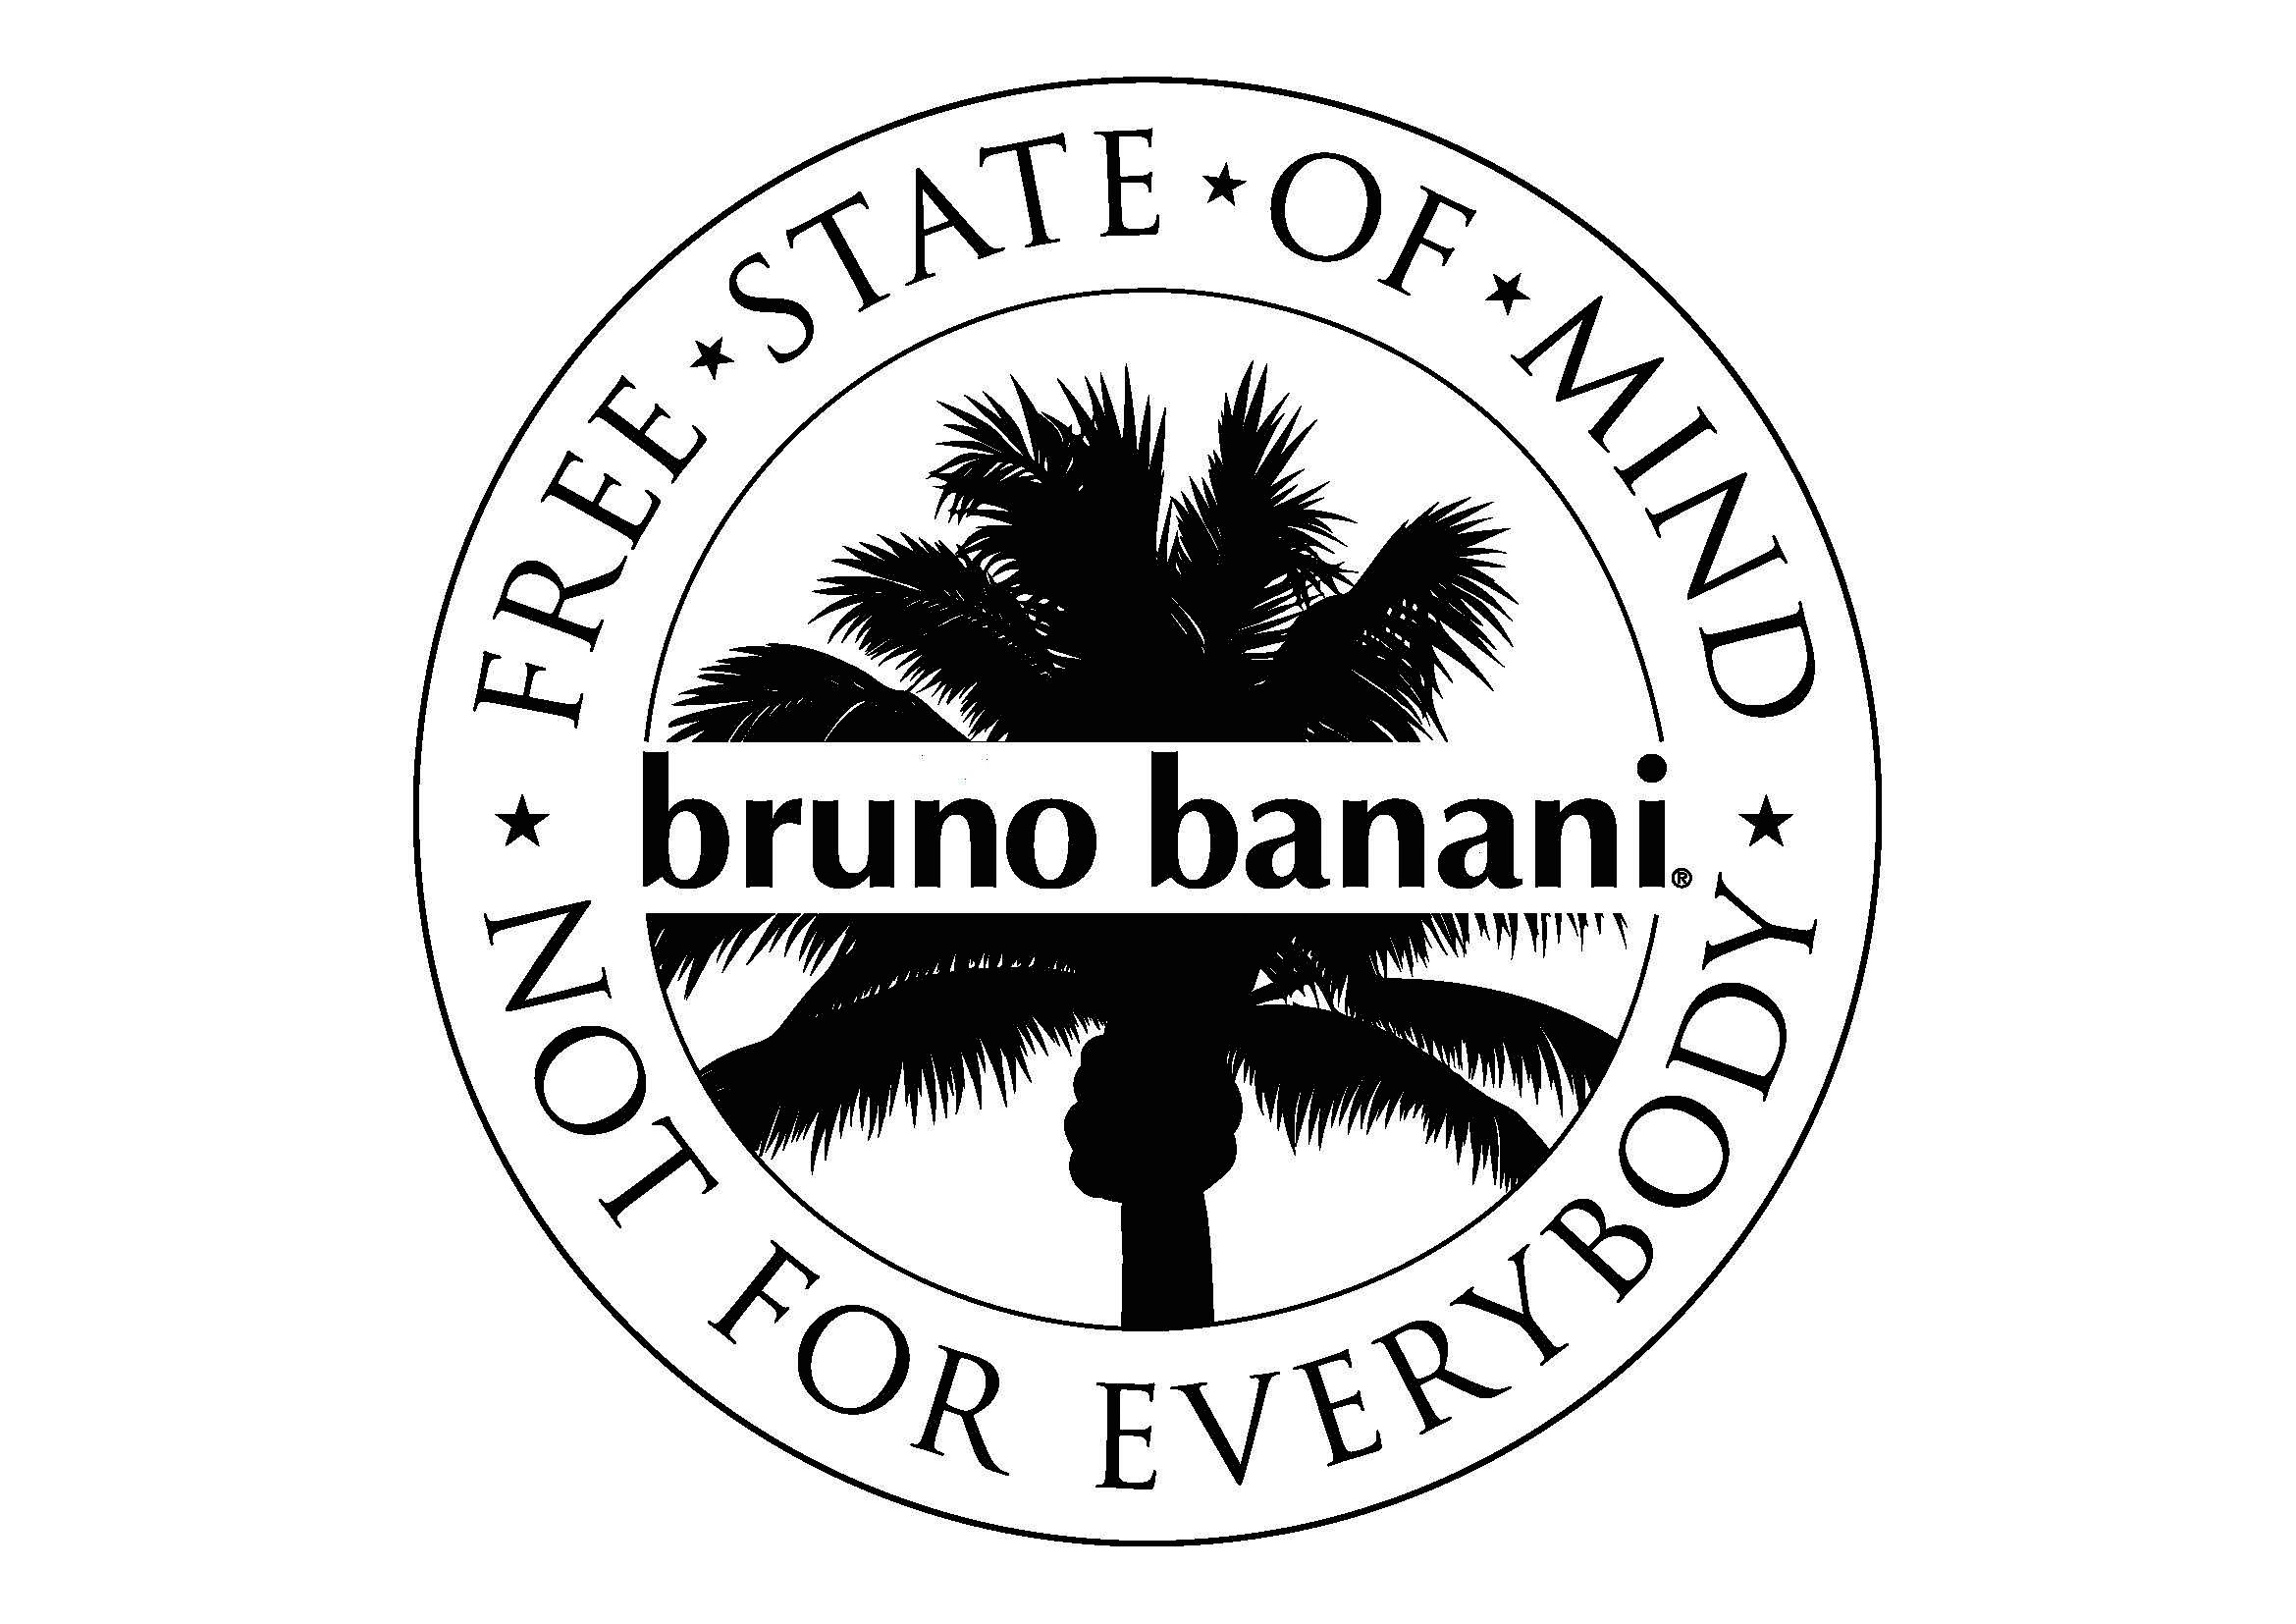 Bildmarke: bruno banani – FREE STATE OF MIND – NOT FOR EVERYBODY